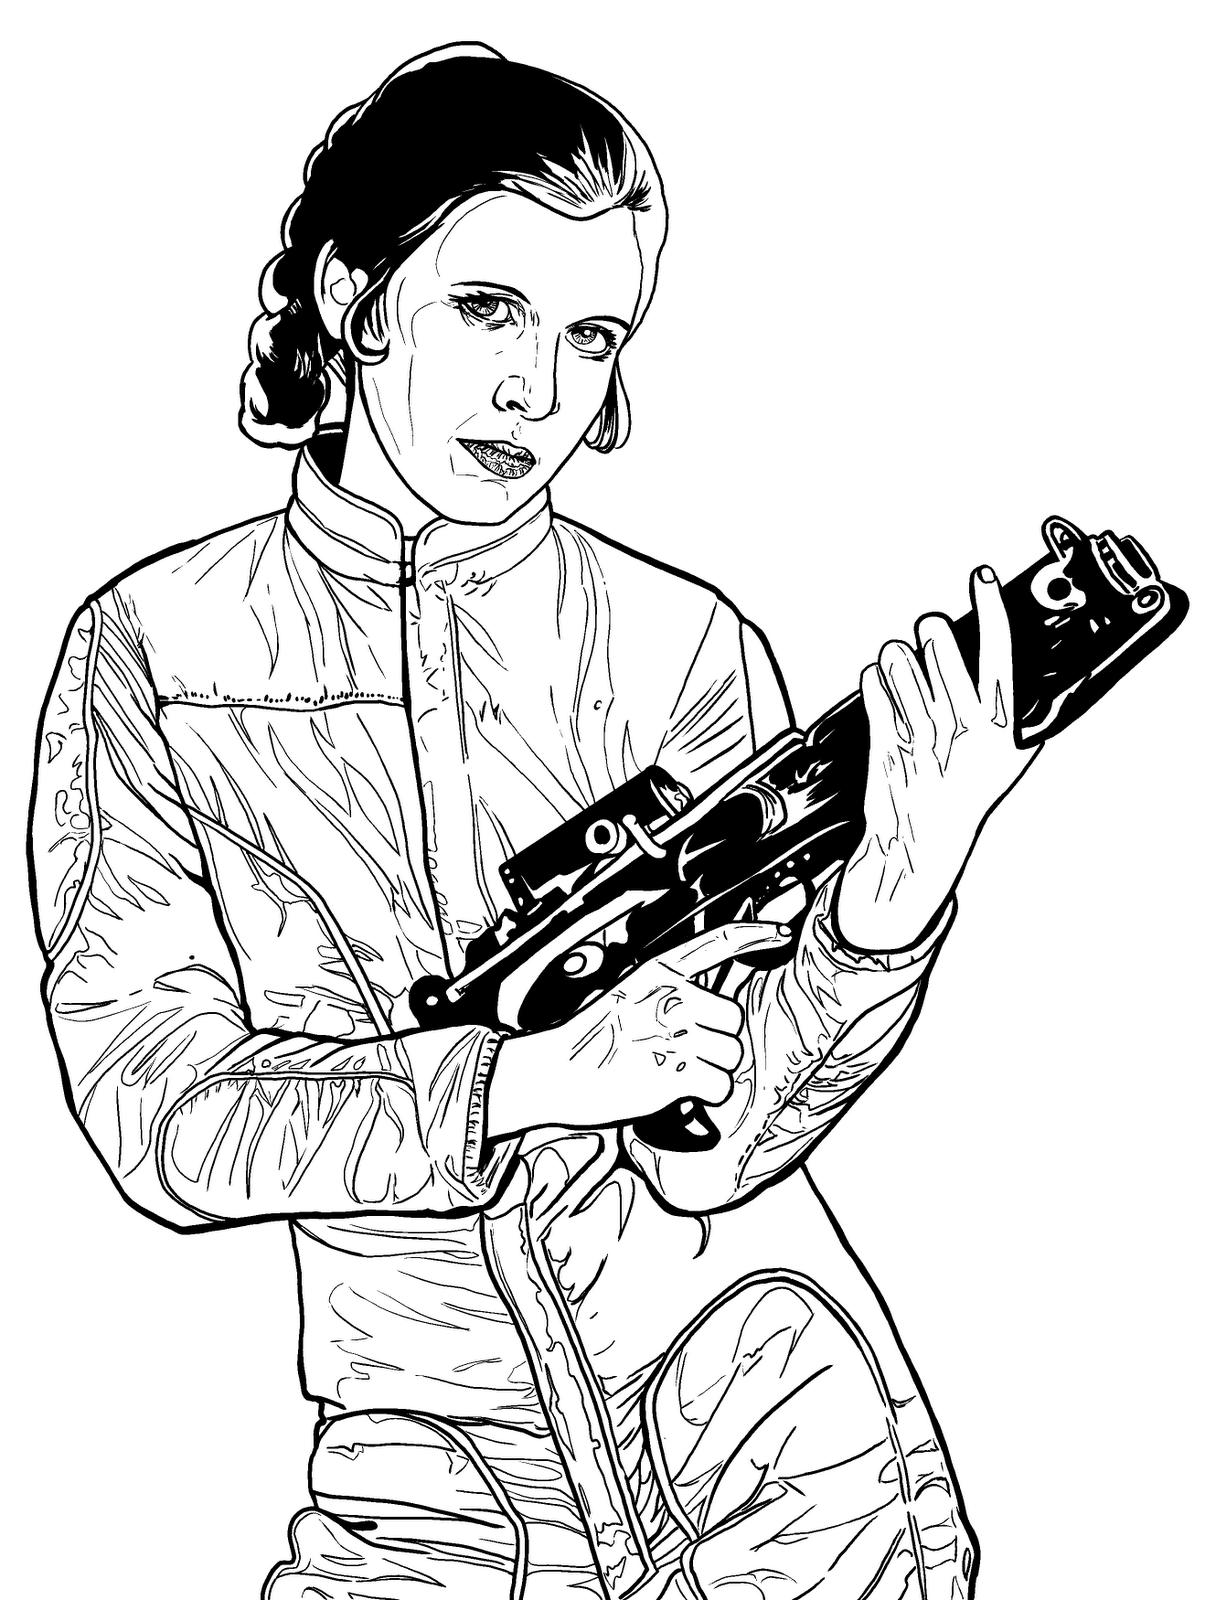 Princess Leia Armed And Dangerous Wacom Intuos Ii Krita 2 5 Git